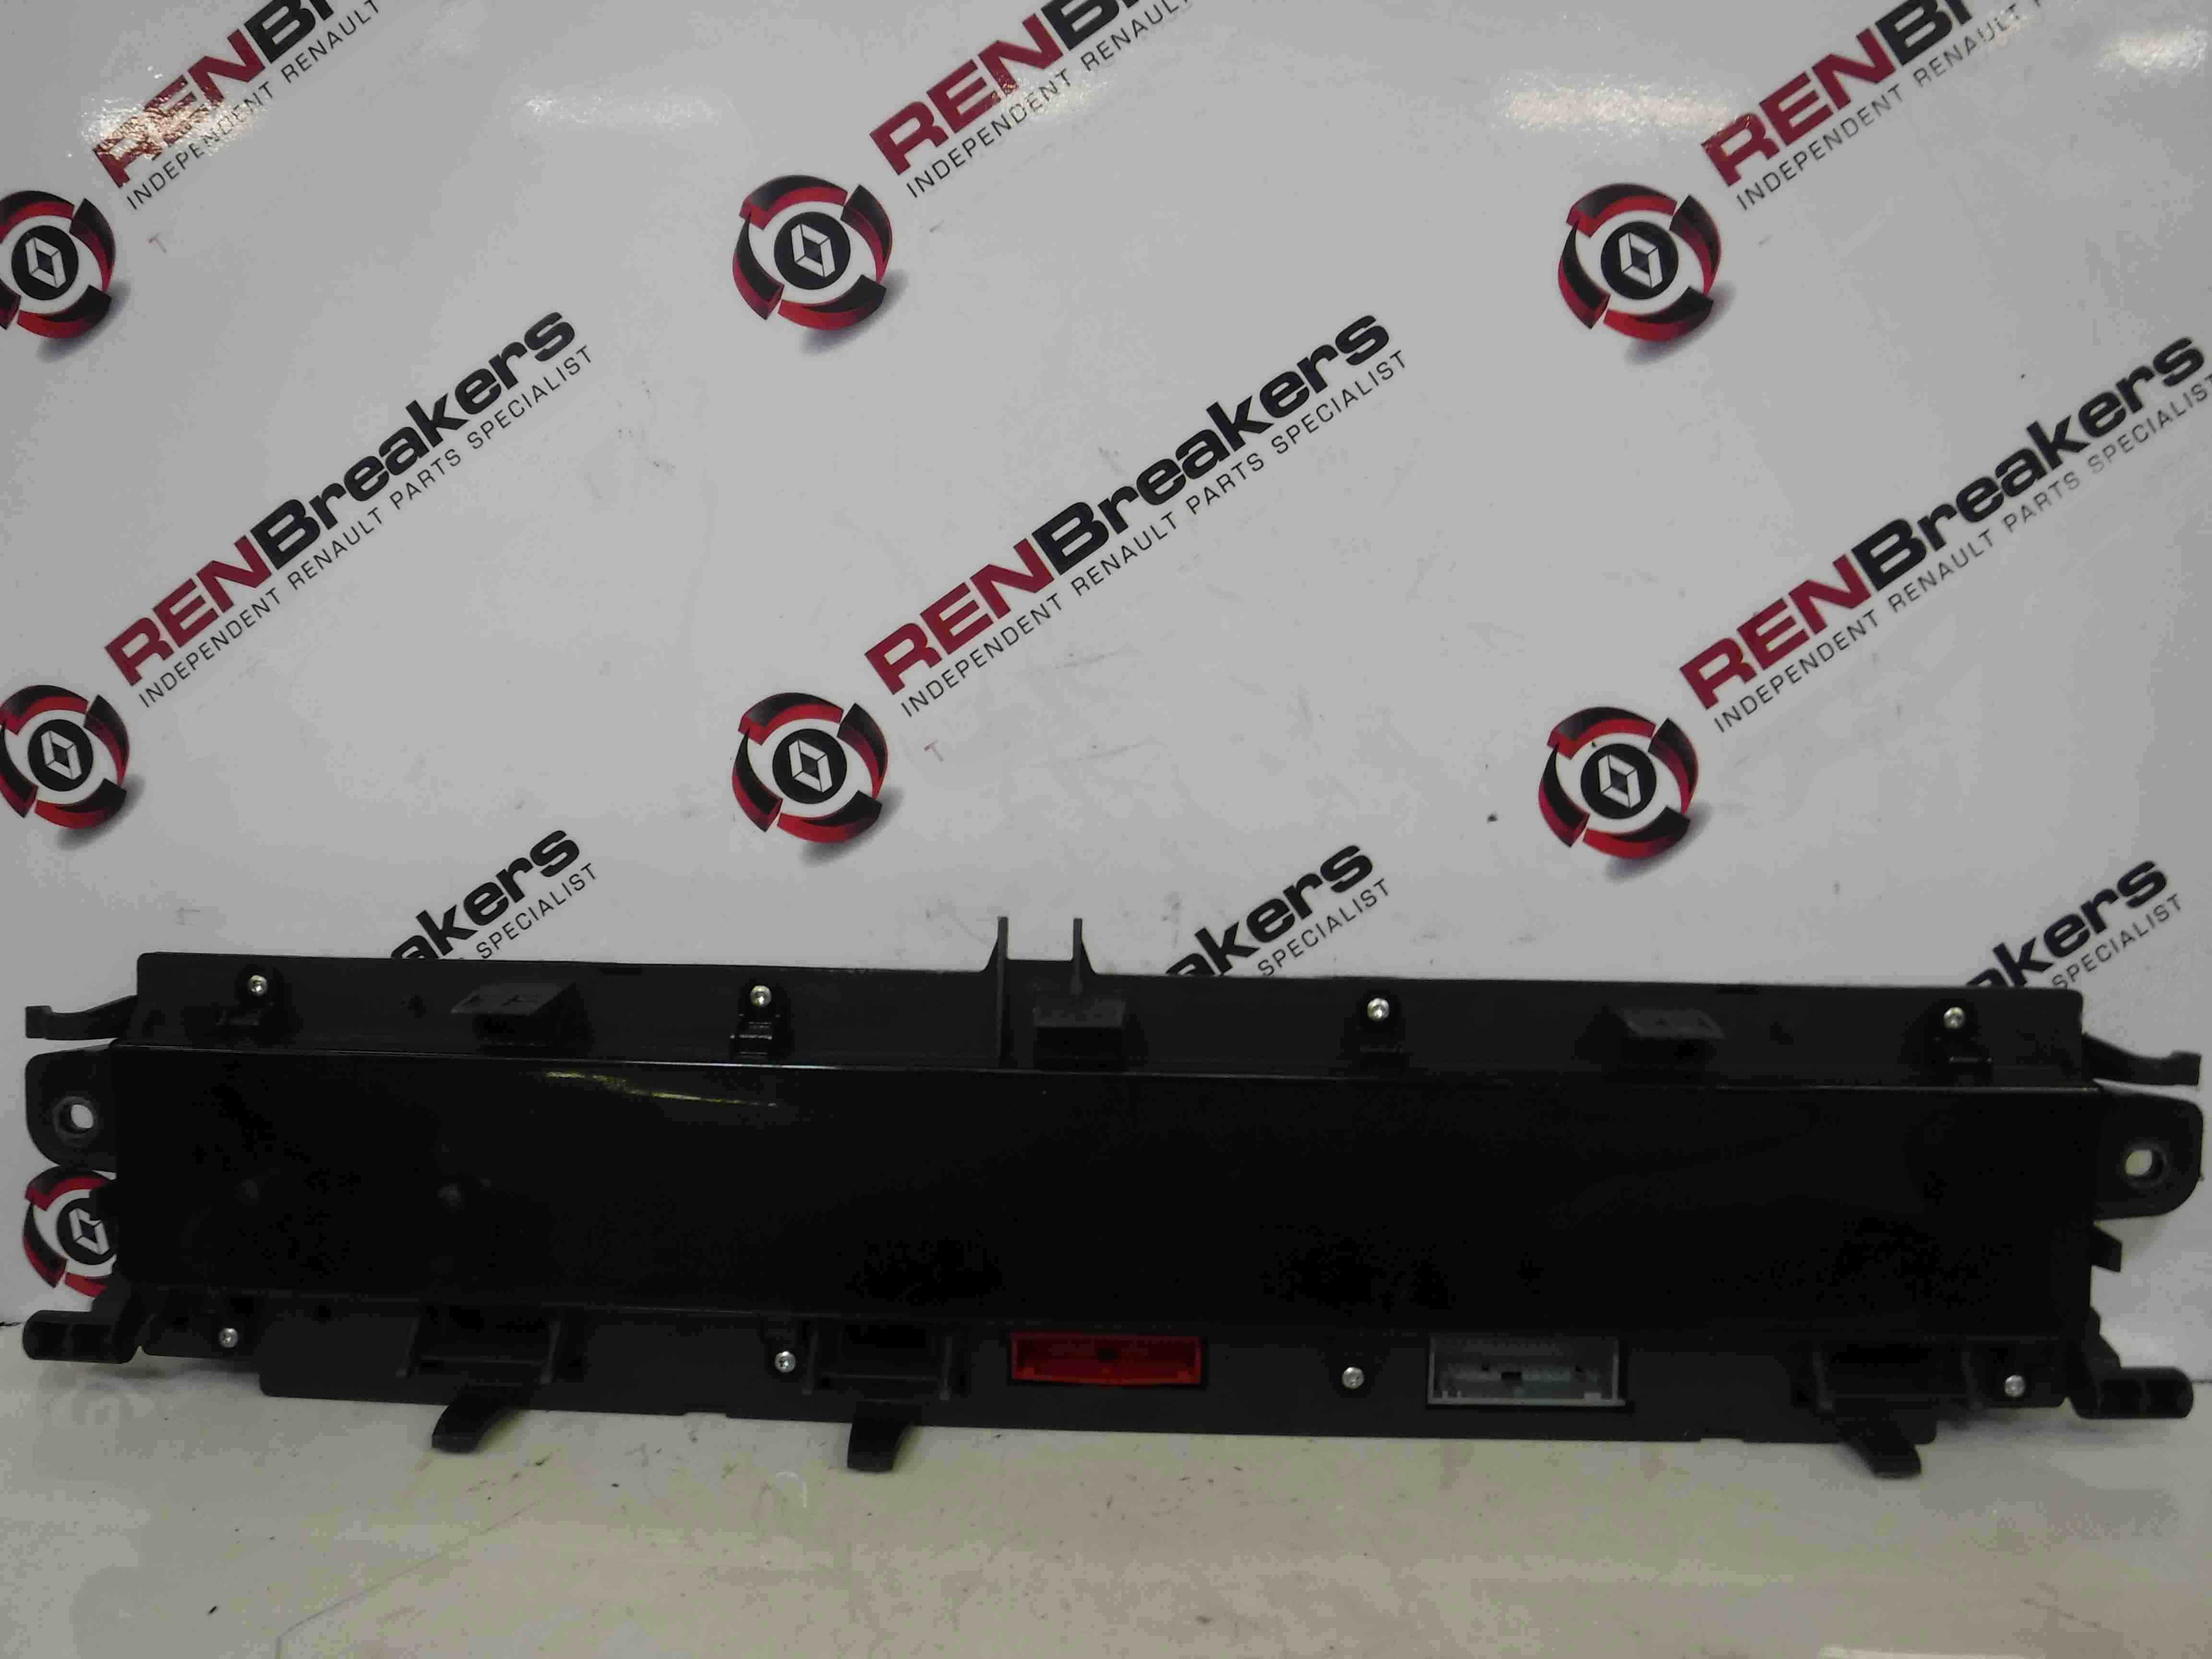 Renault Scenic 2003-2009 Dashboard Instrument Panel Clocks 50K 8200365607